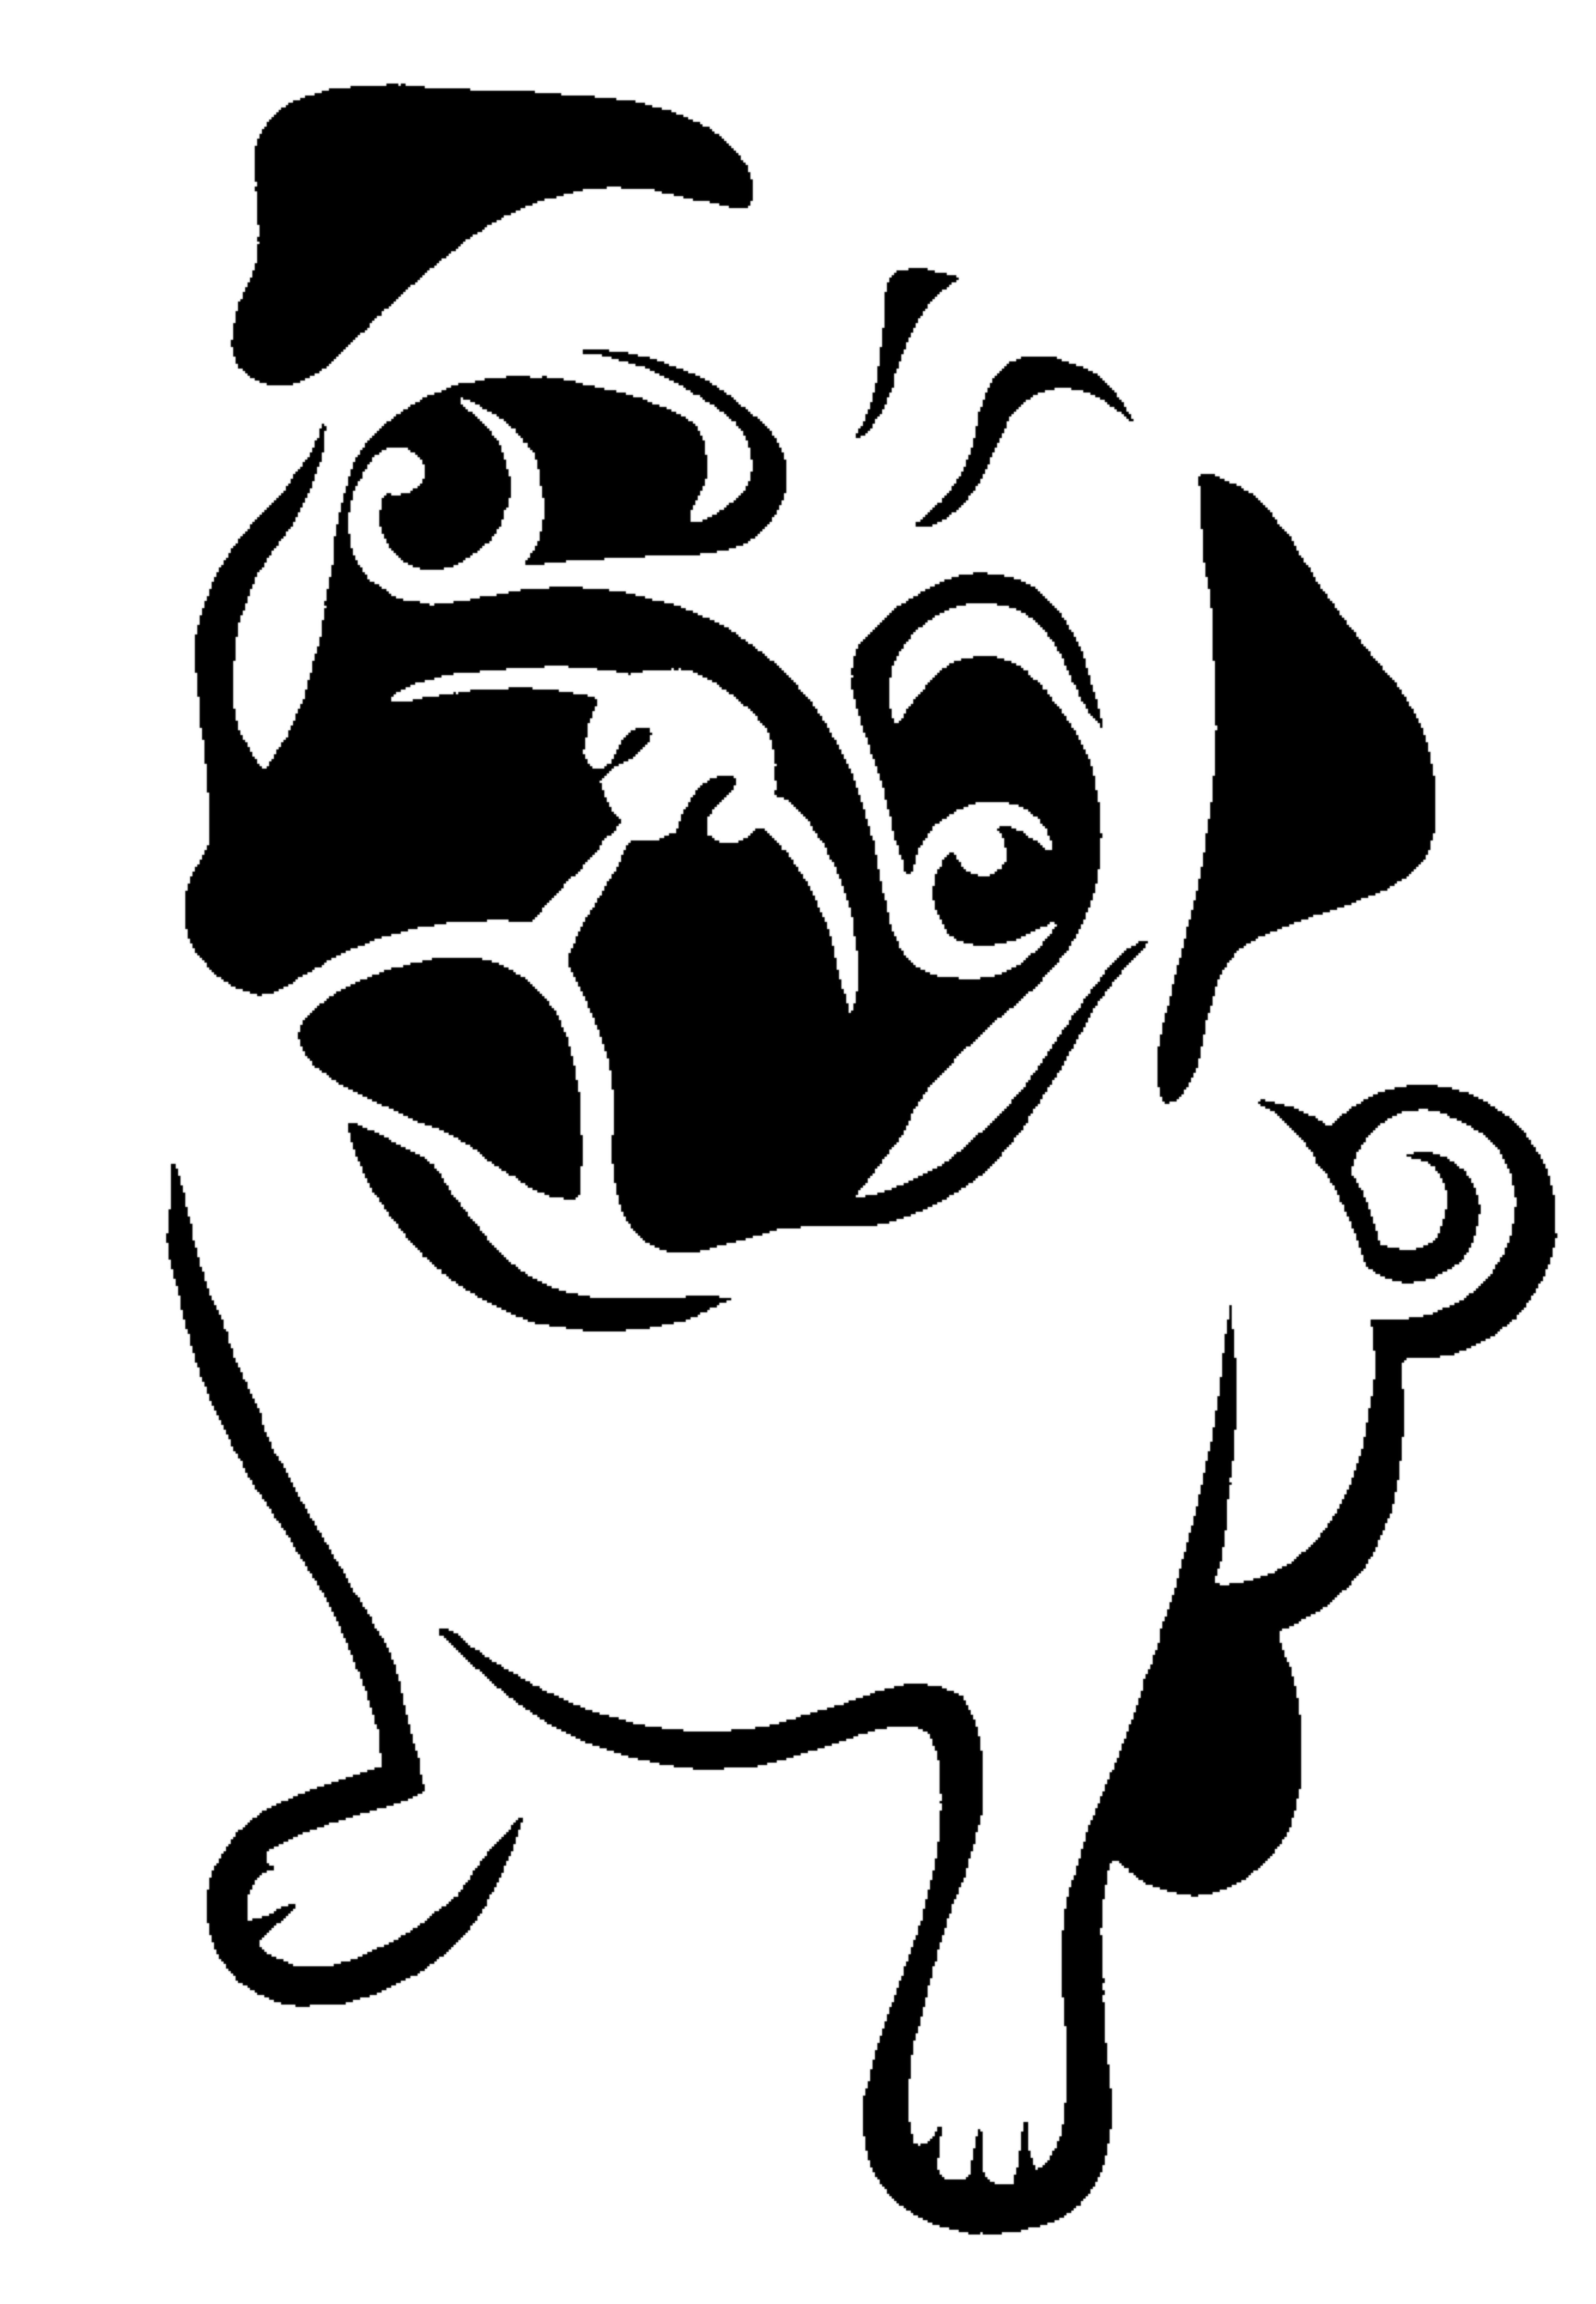 Pug stencil